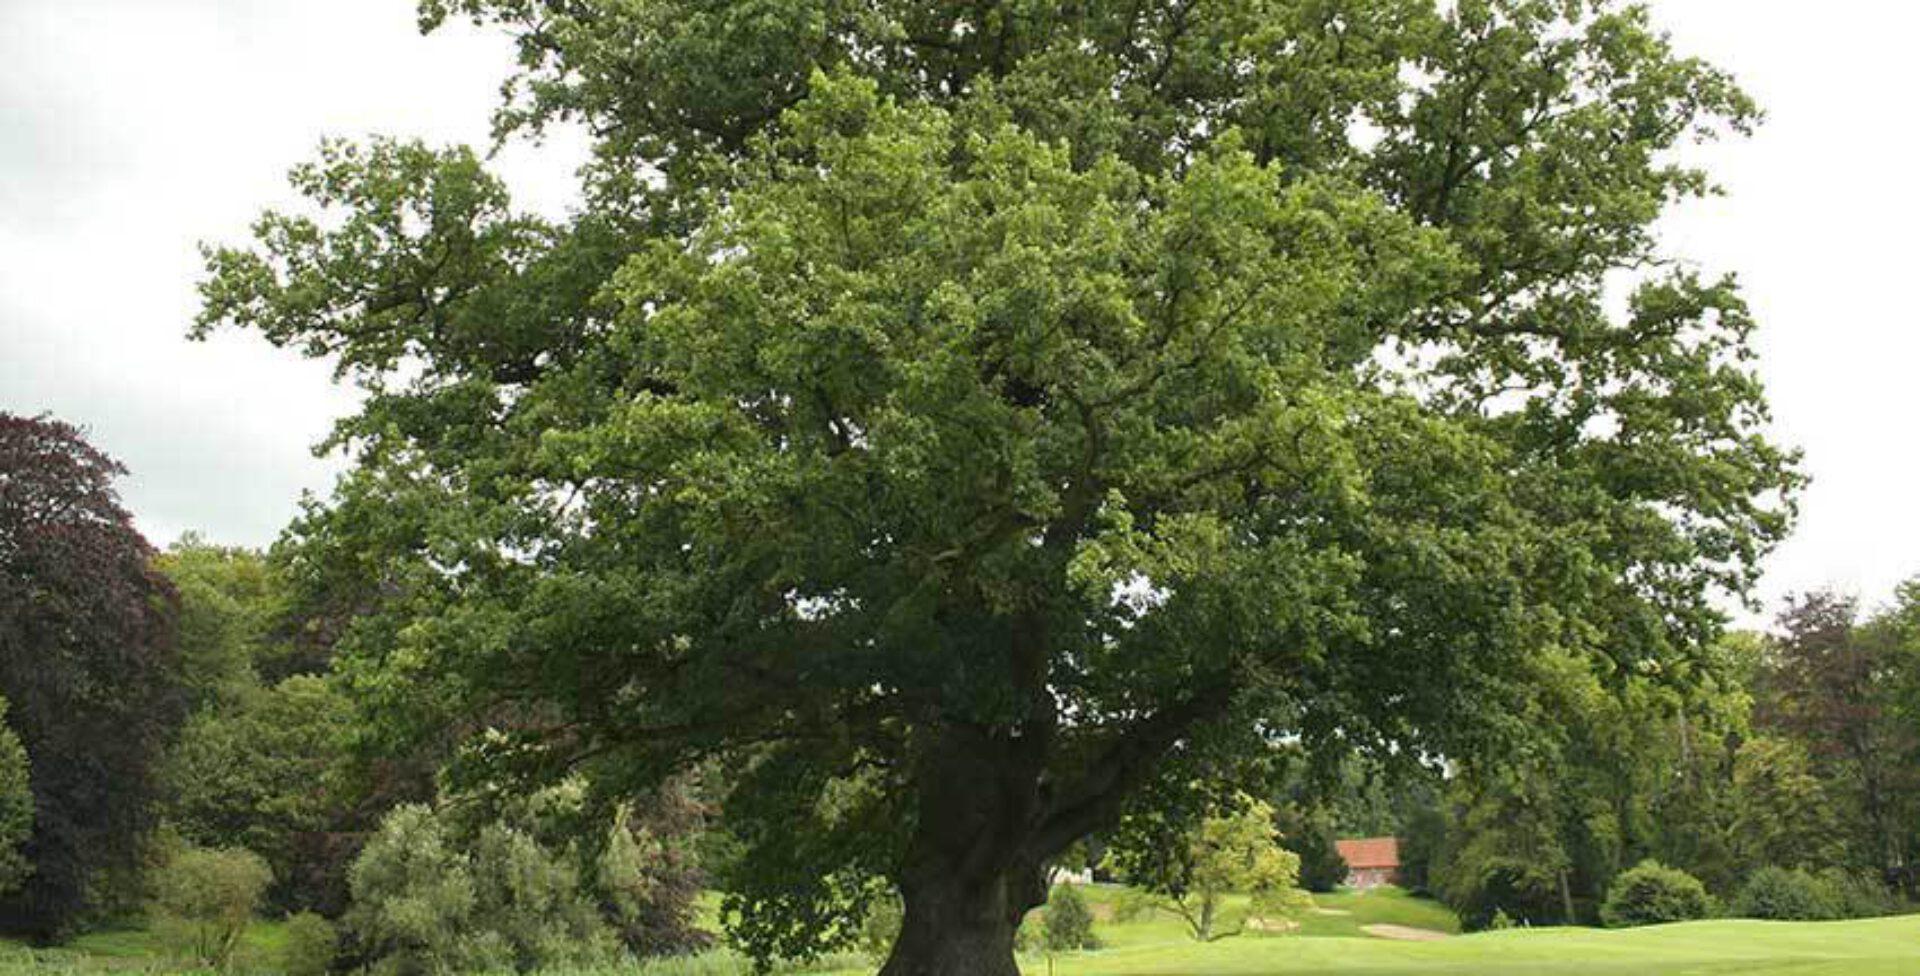 Kruid van de maand - Zomereik (Quercus robur)